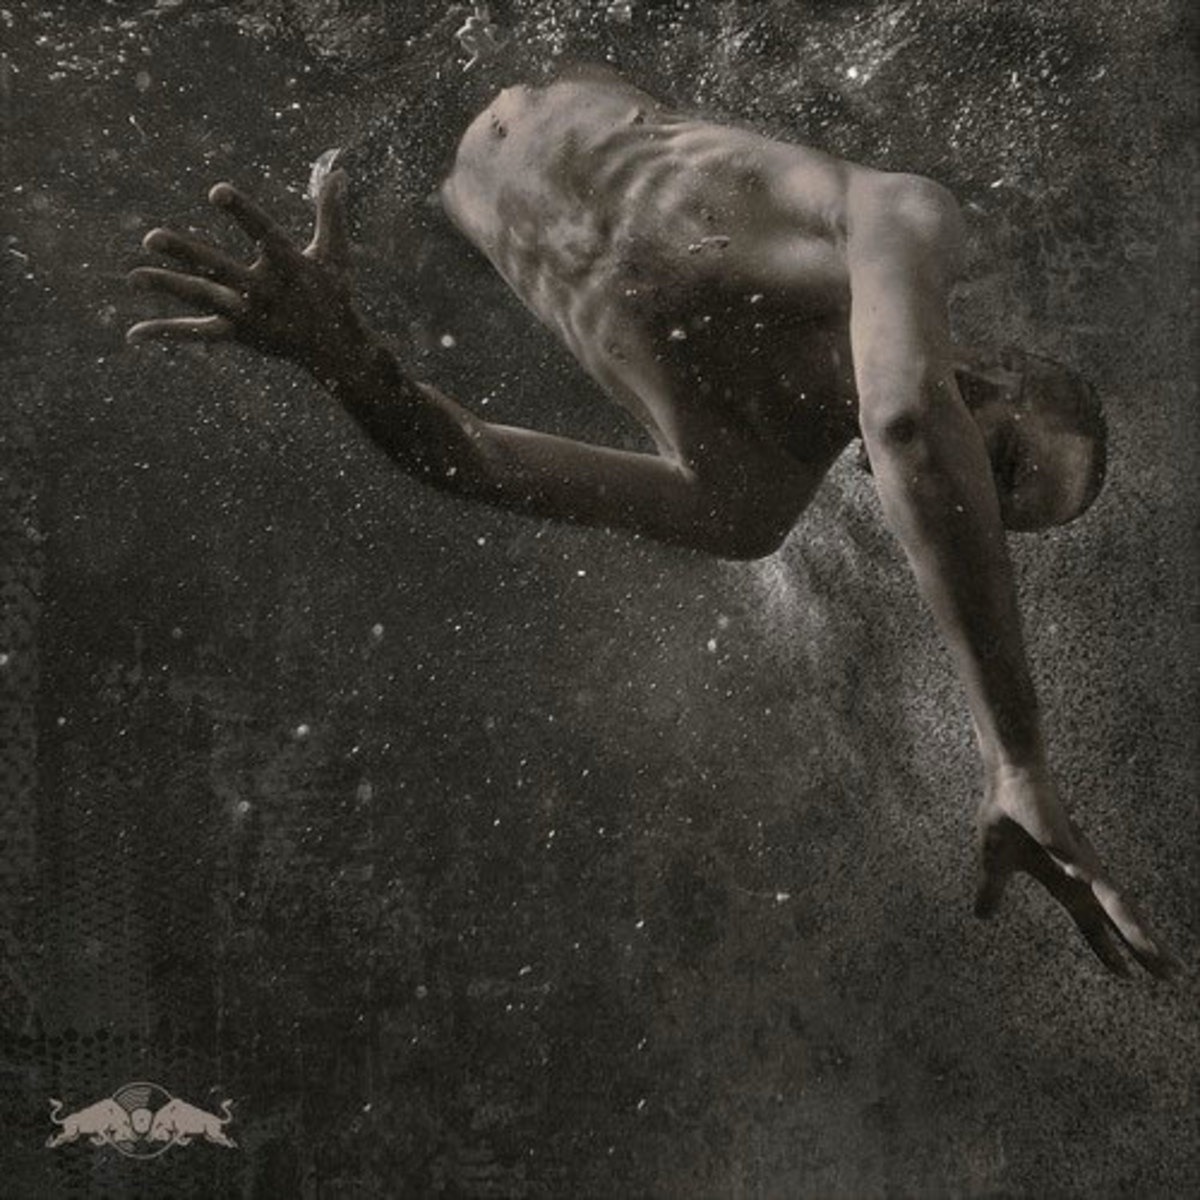 mick-jenkins-drowning.jpg